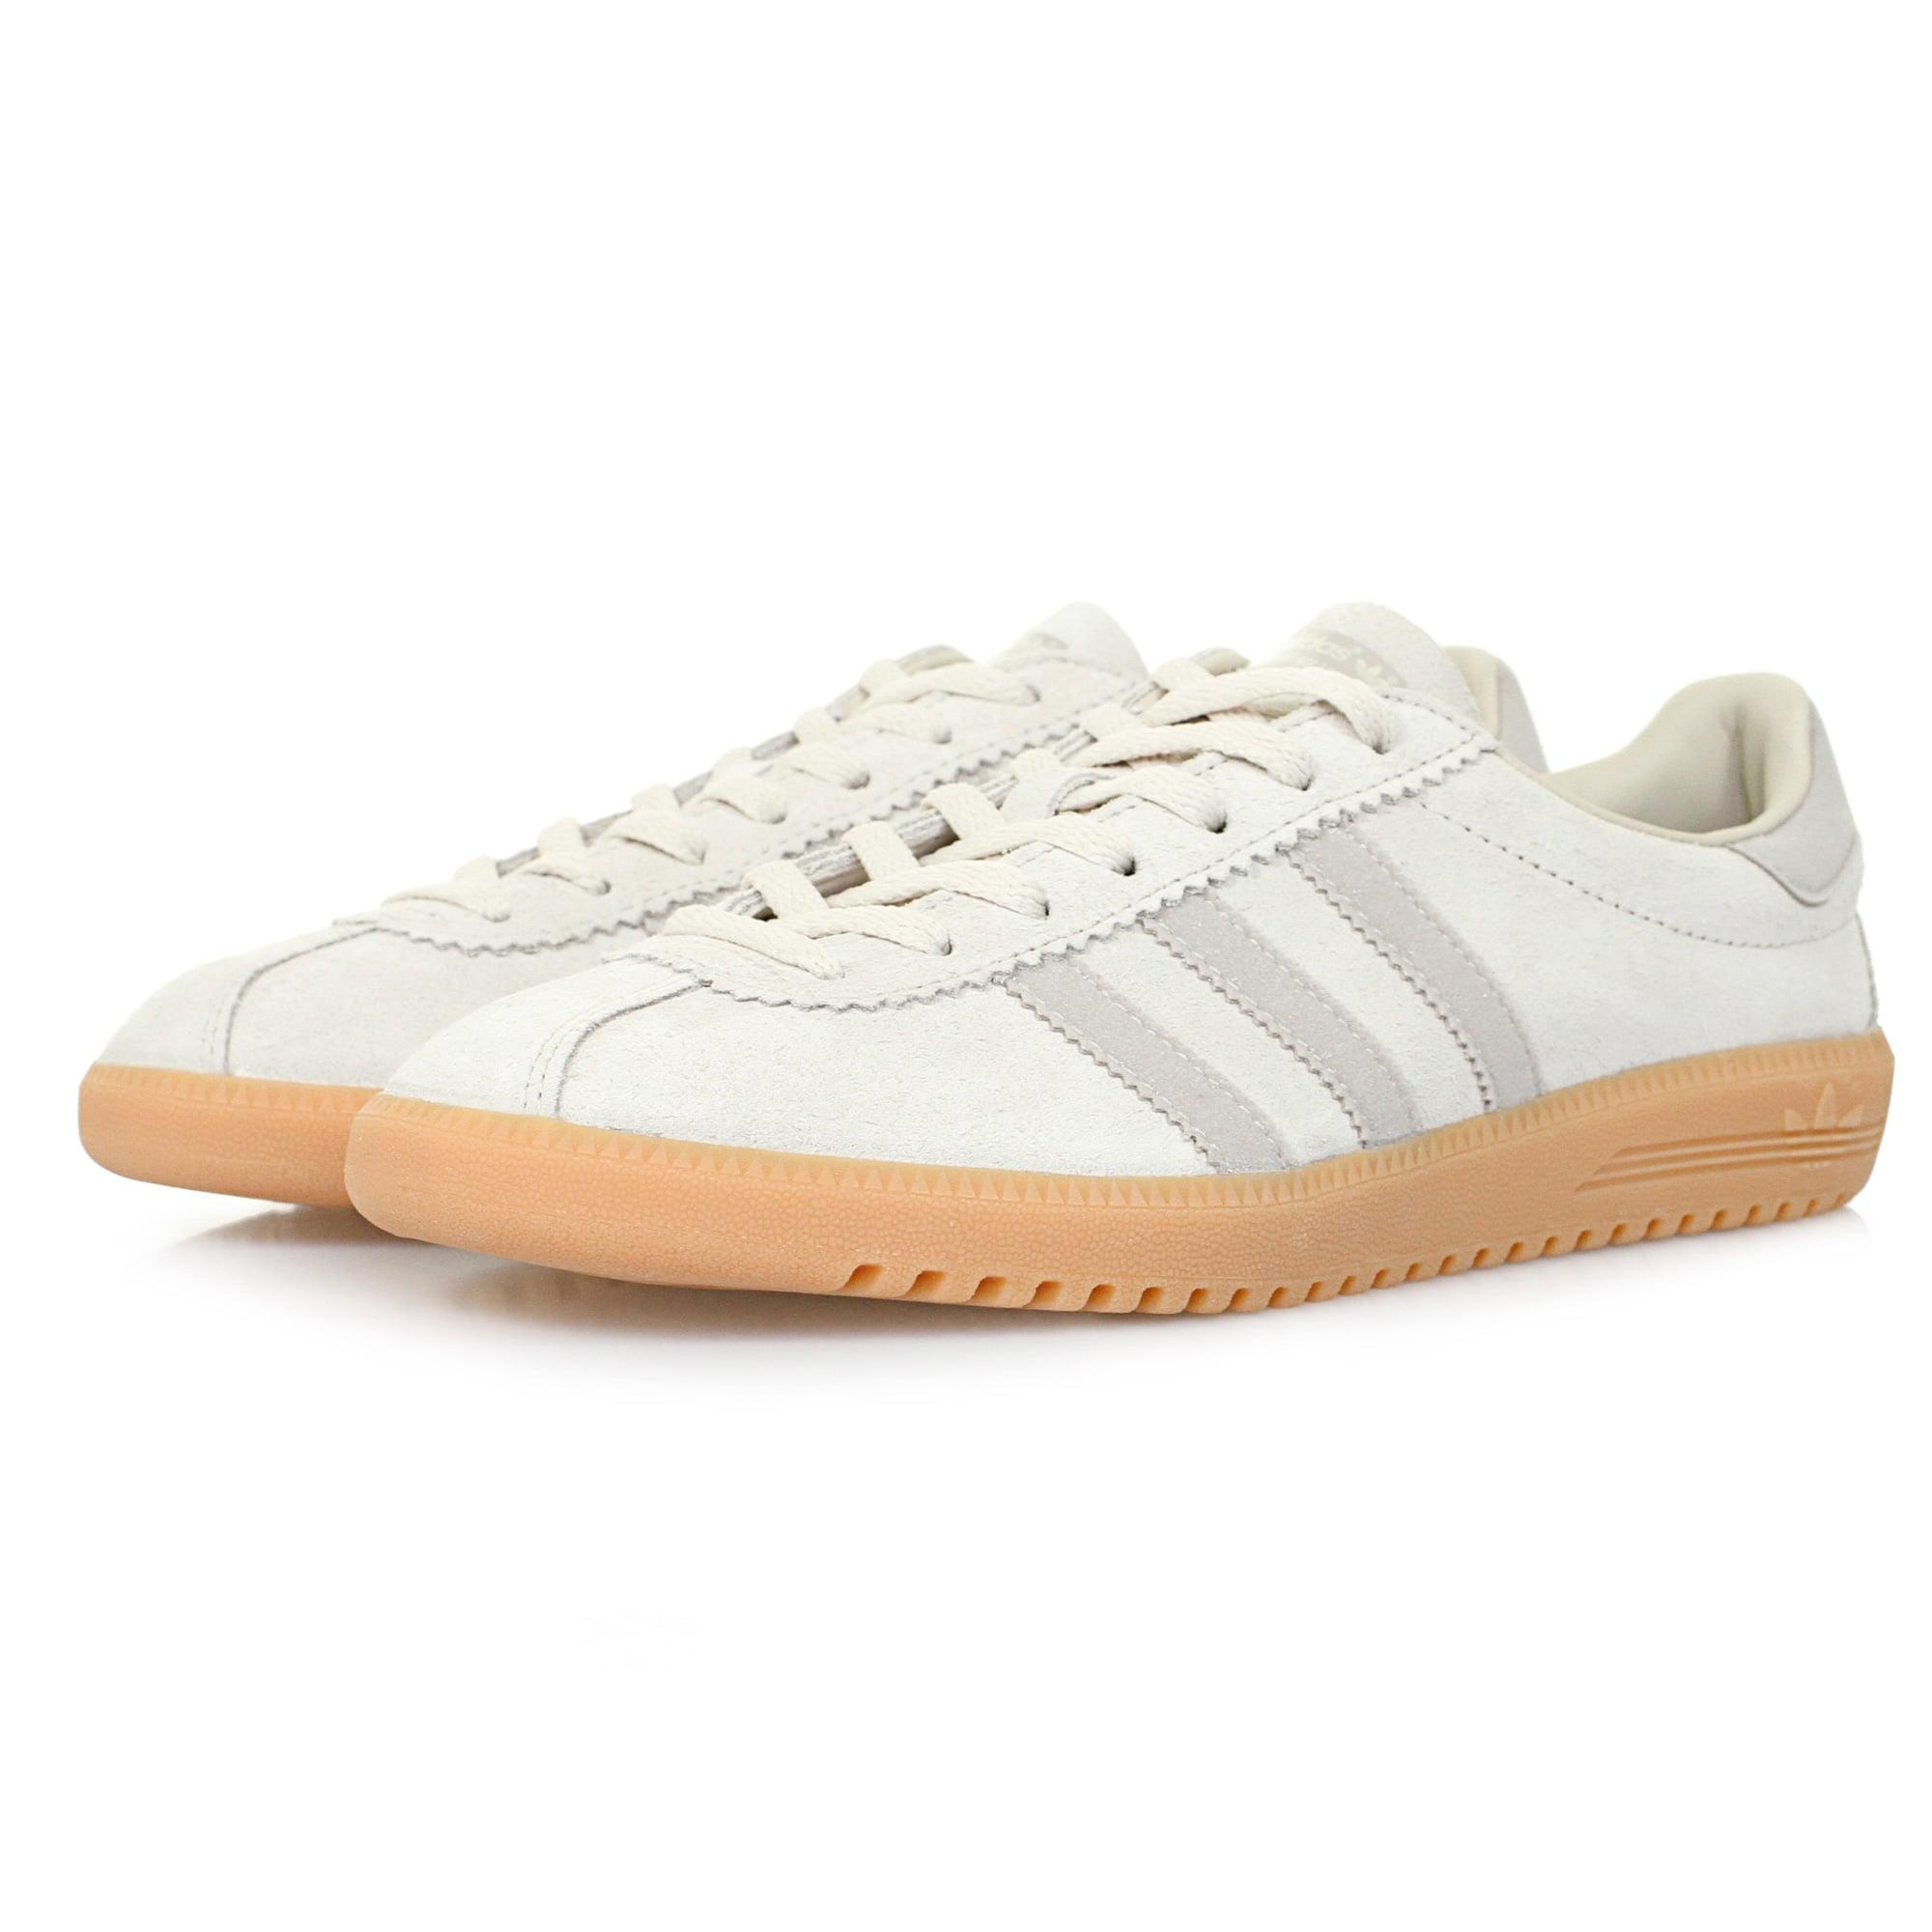 Adidas Originals Bermuda Brown Shoes For Sale